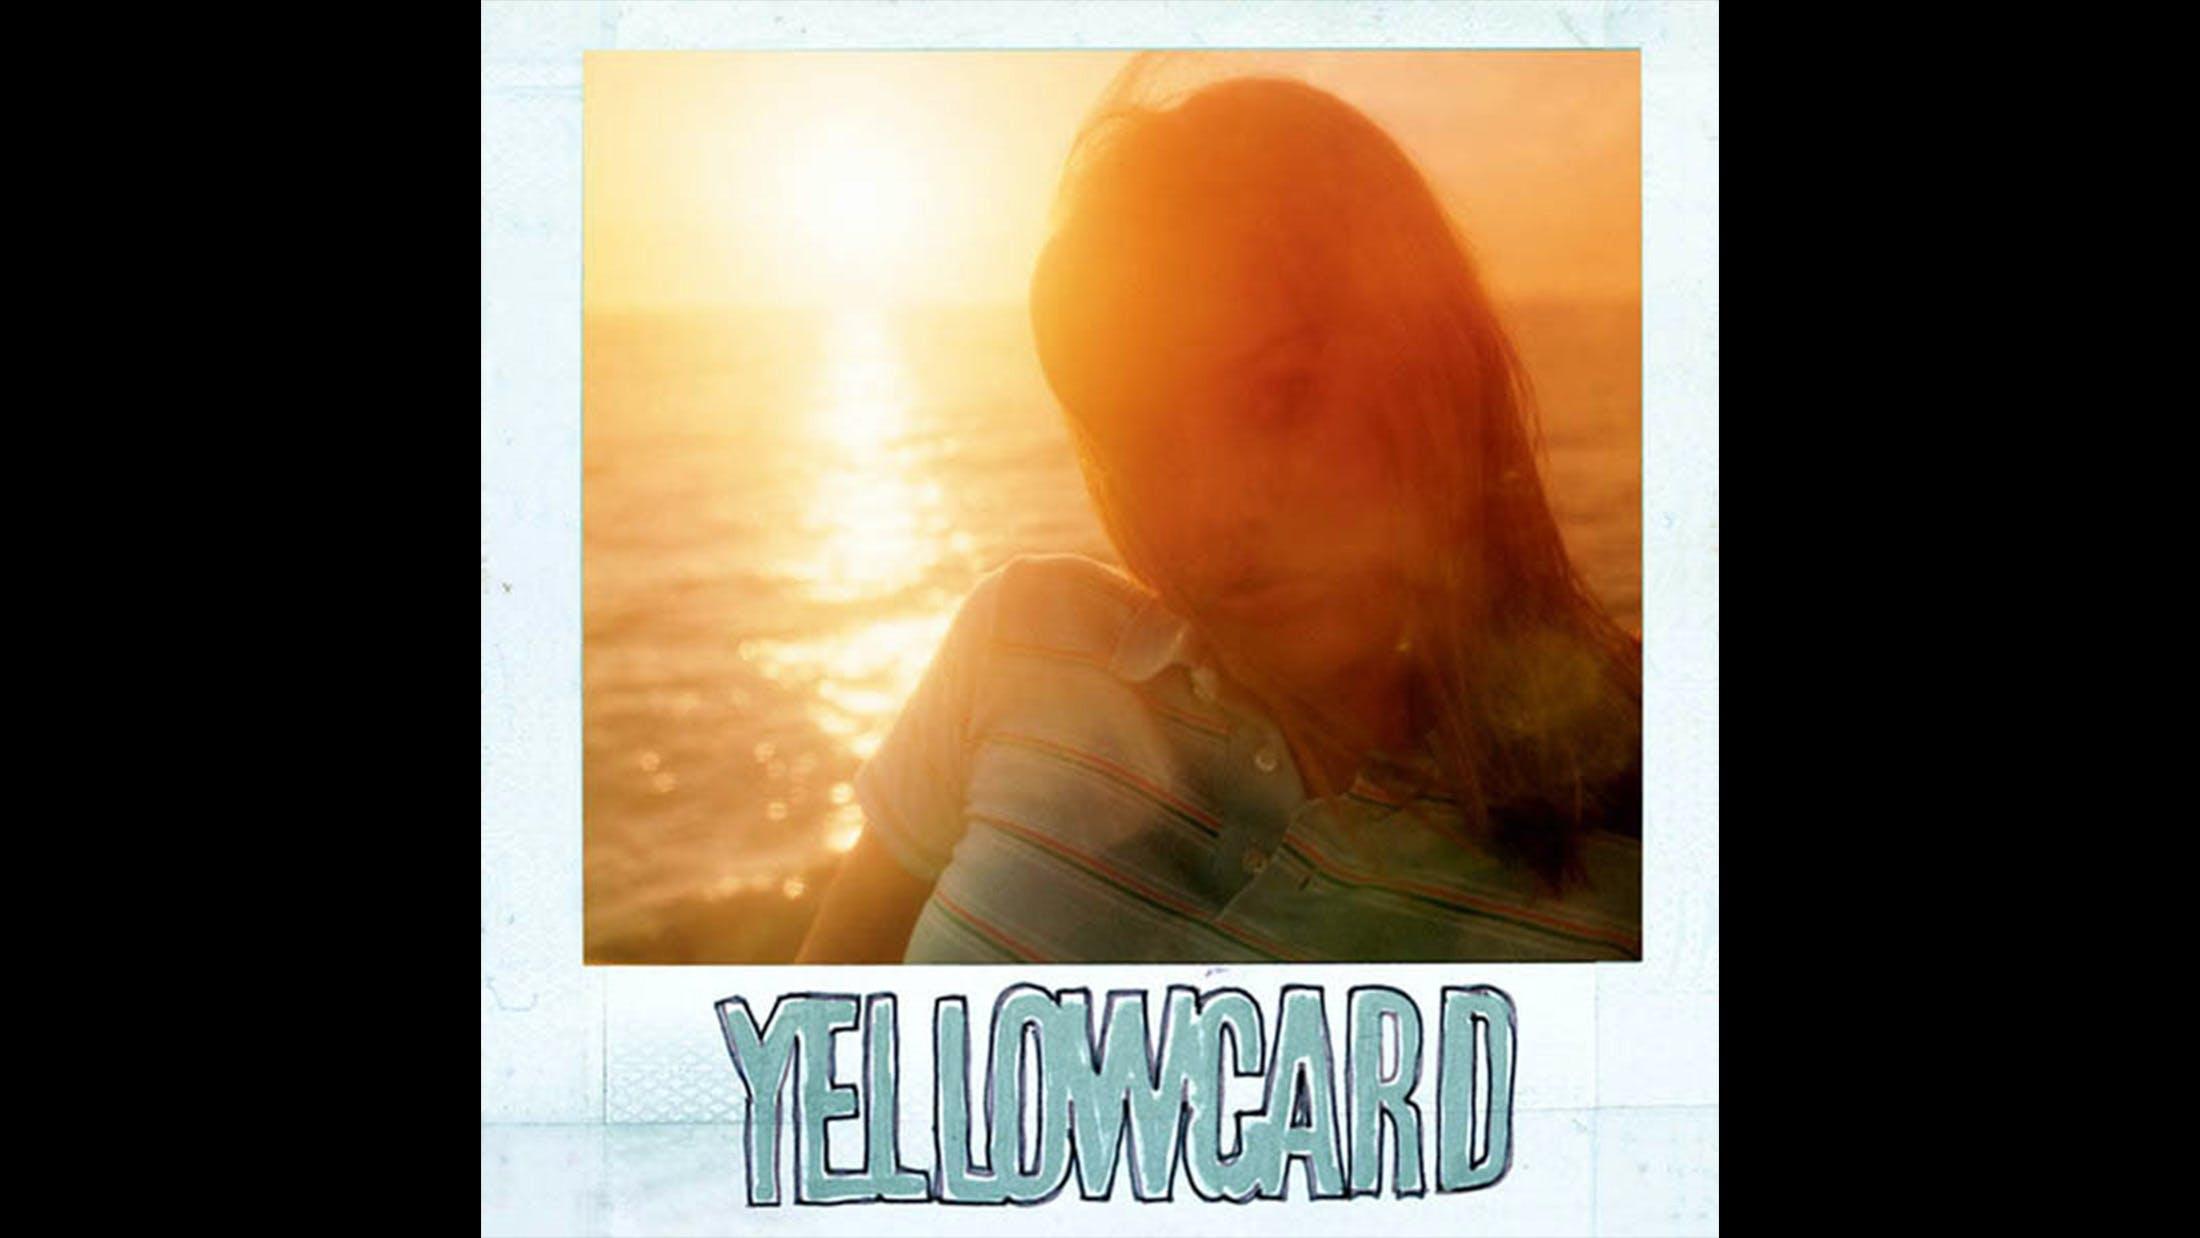 40. Yellowcard - Ocean Avenue (2004)